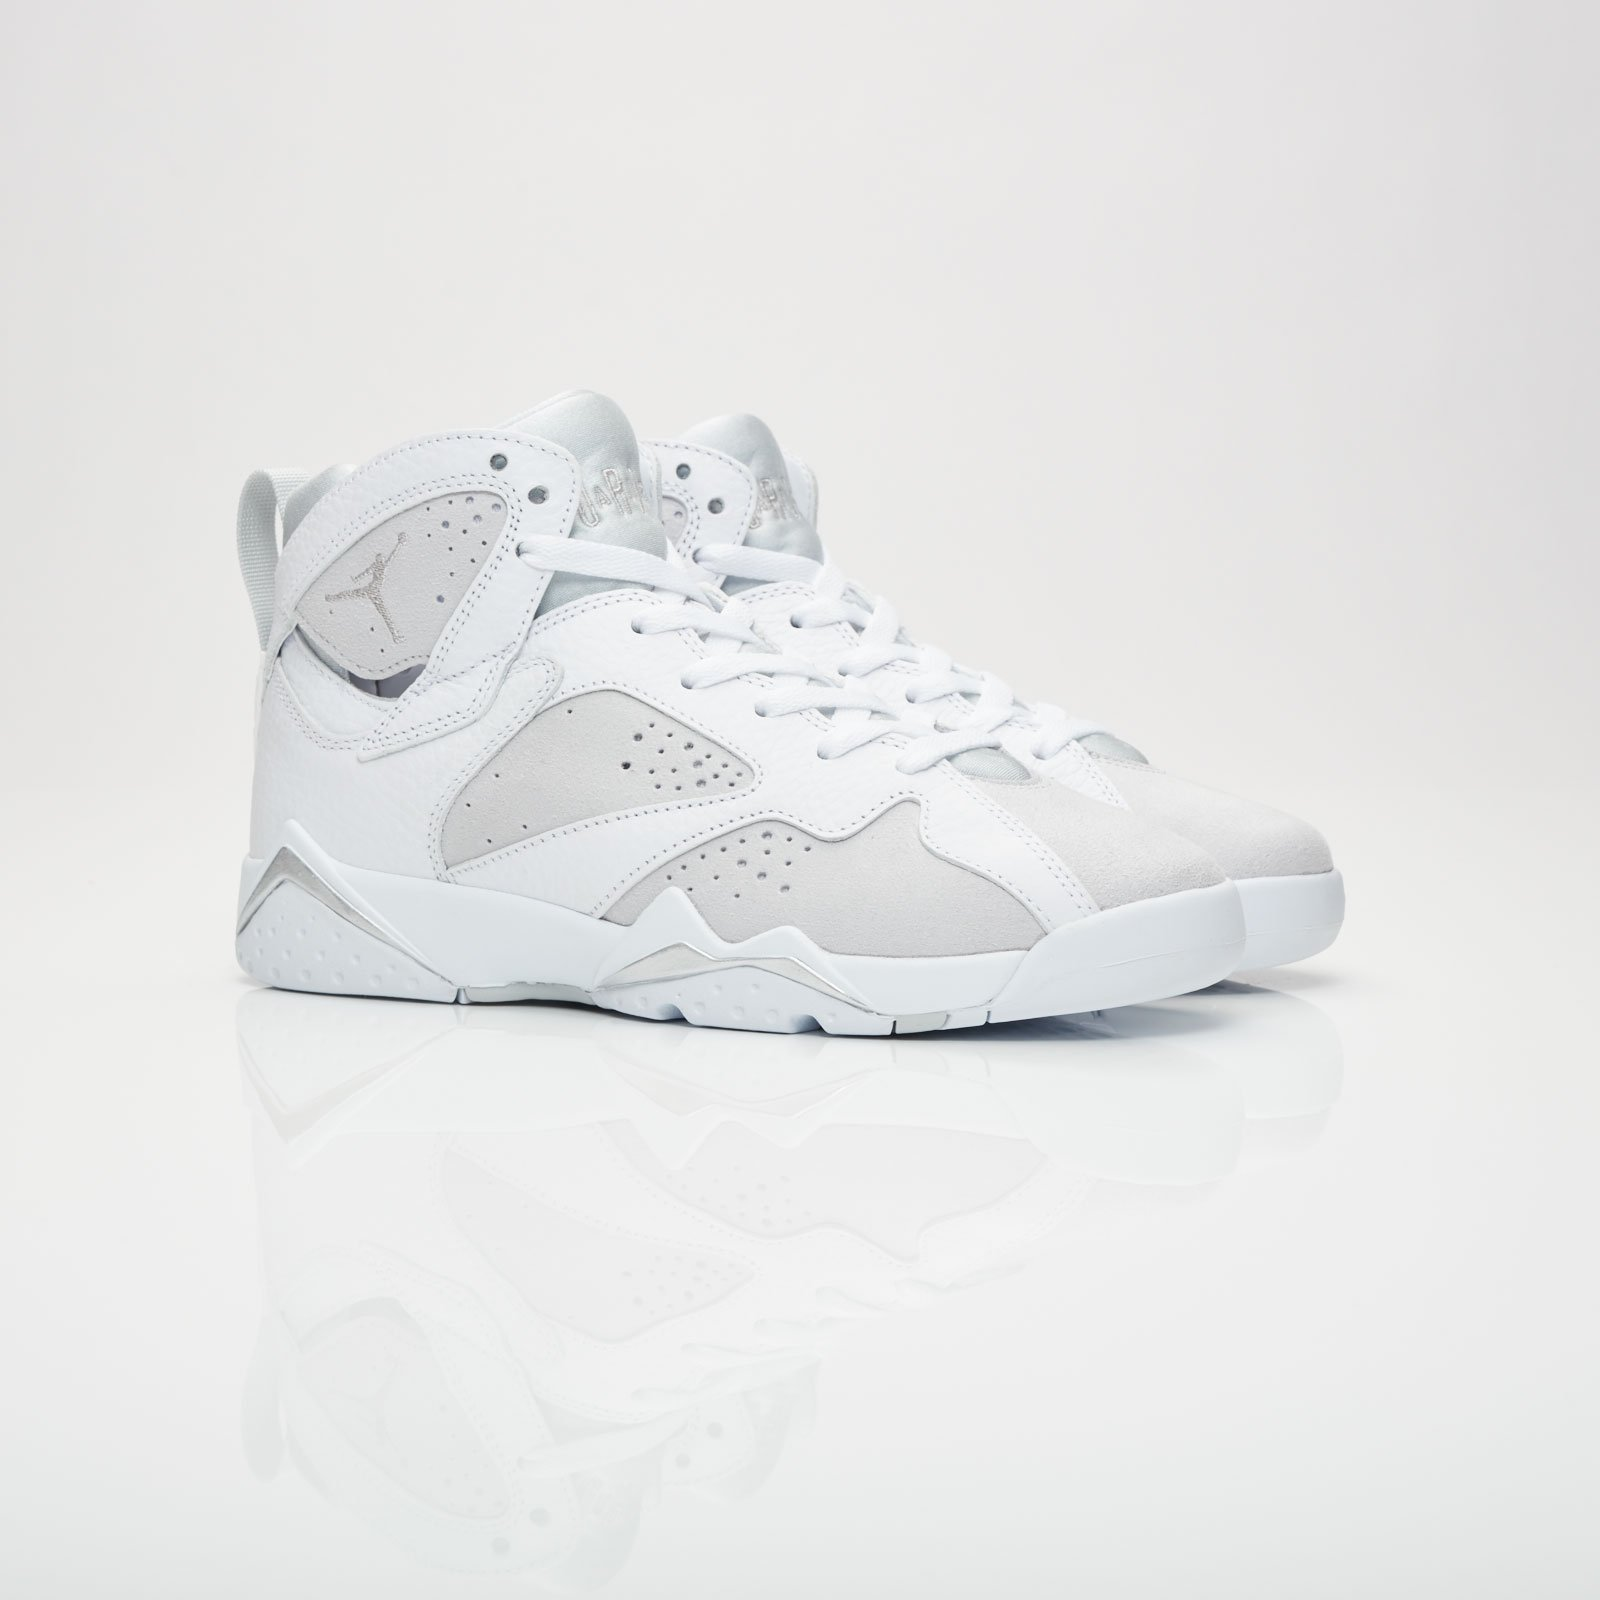 sports shoes ee652 beeb6 Jordan Brand Air Jordan 7 Retro (GS) - 304774-120 ...